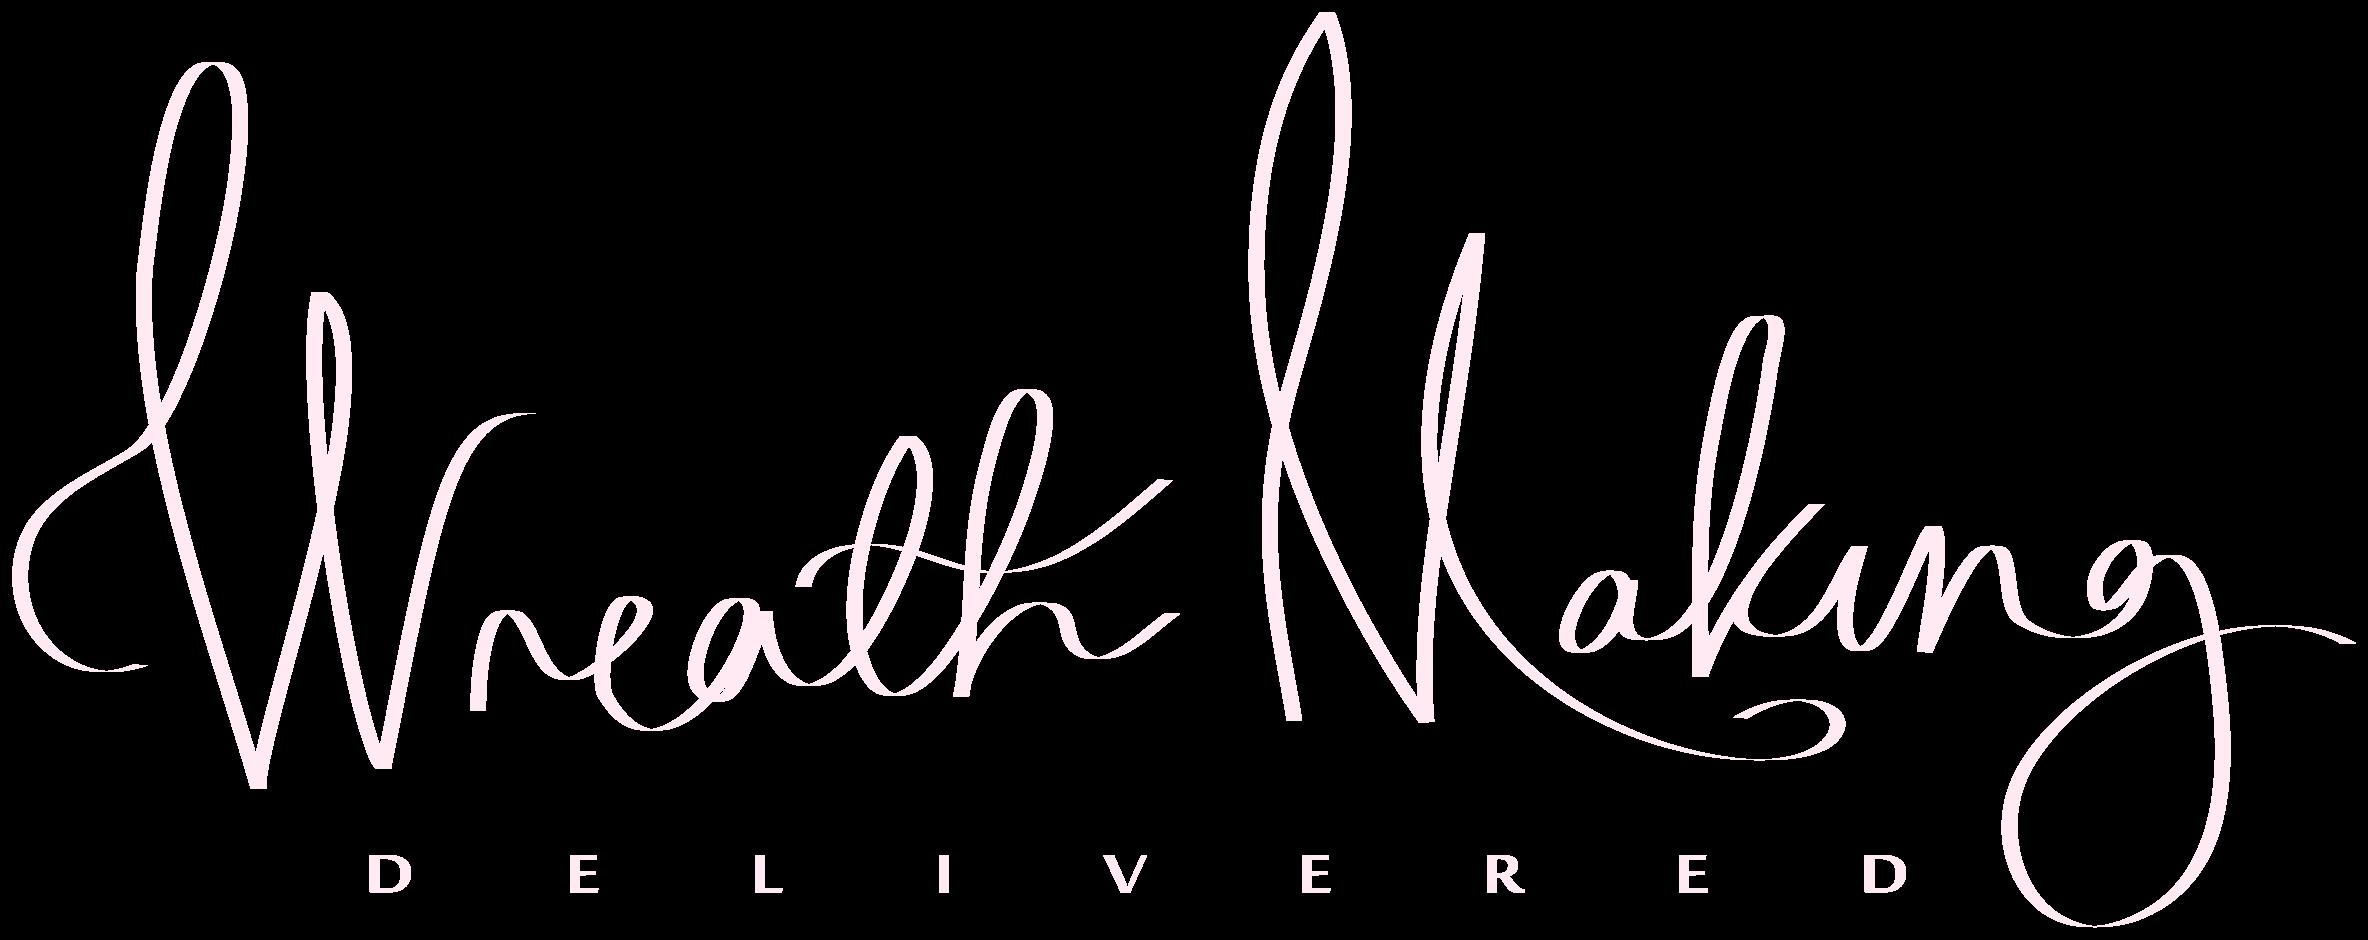 wreath making delivered logo migsy pink.png